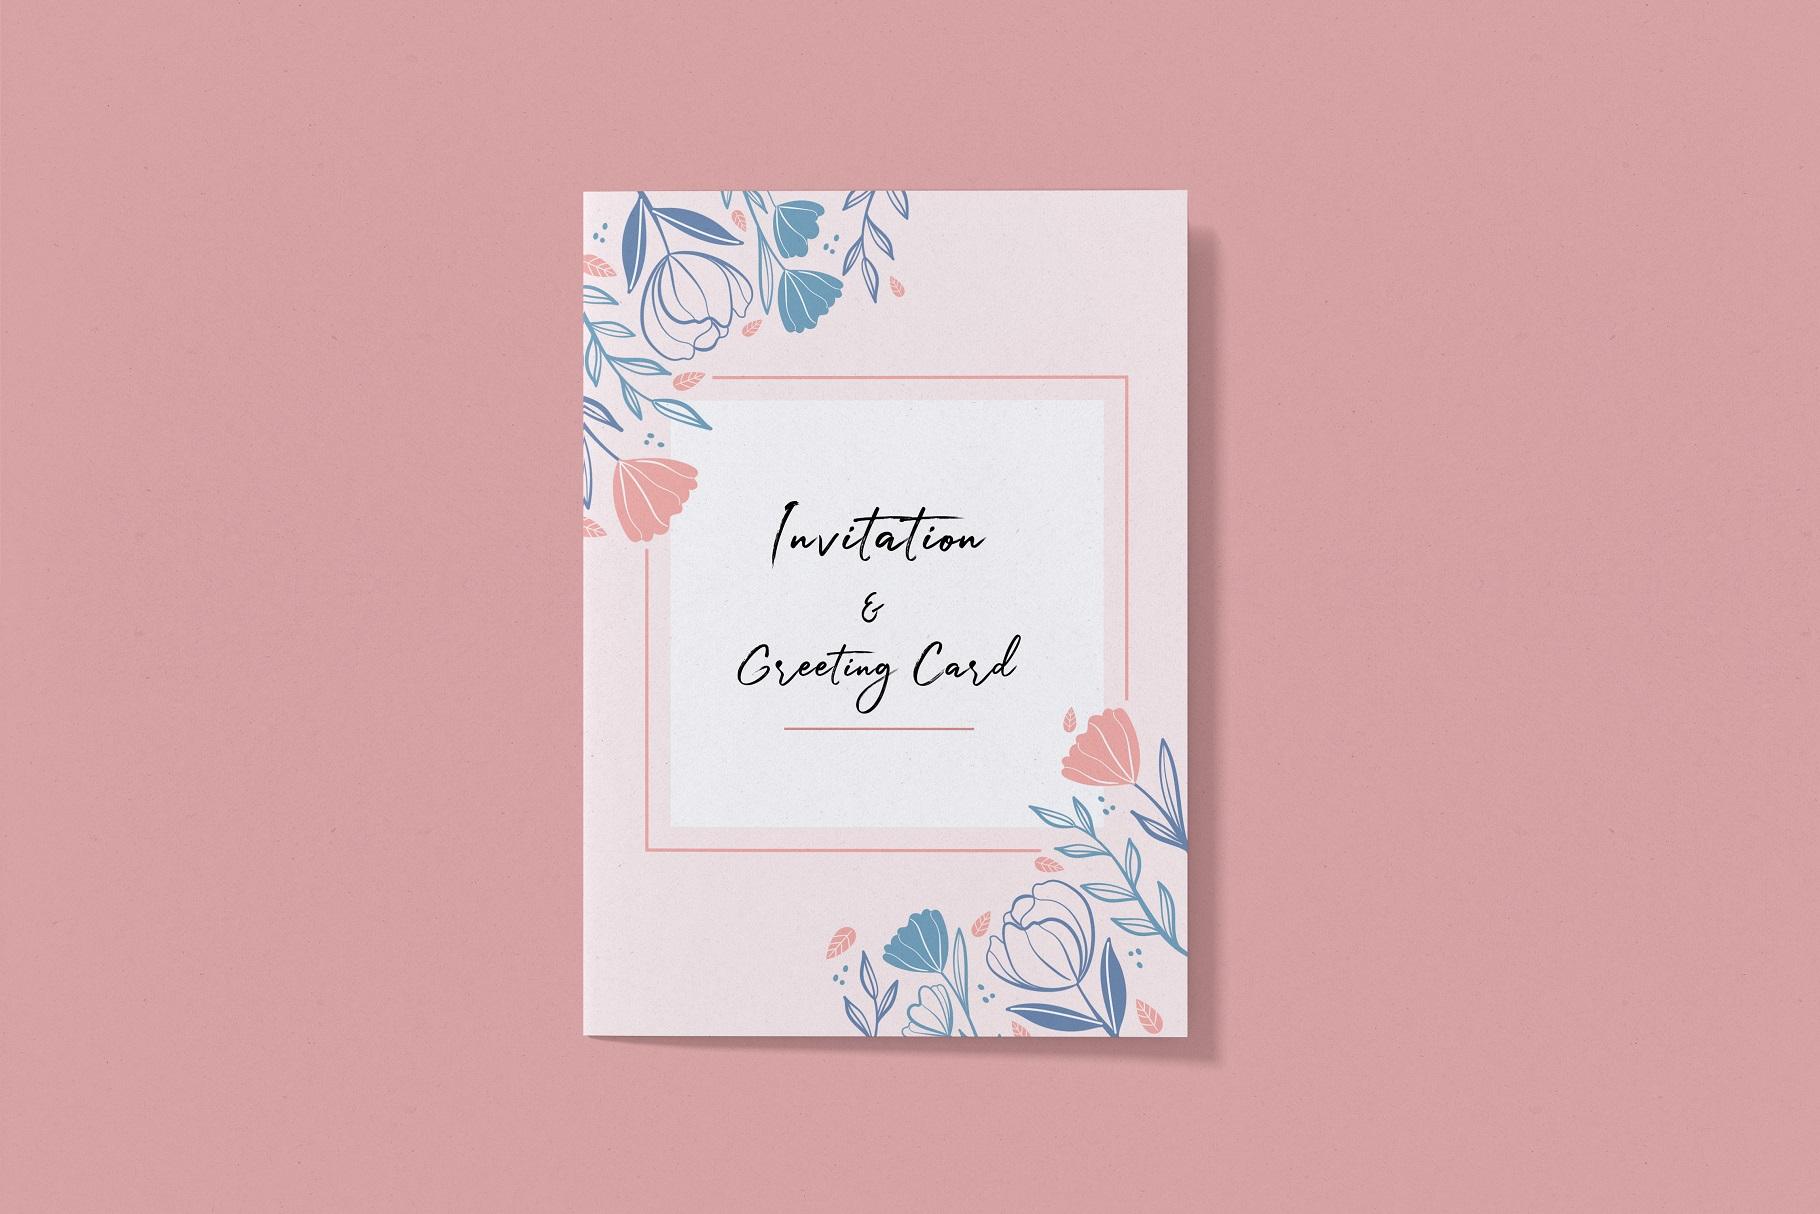 Invitation & Greeting Card Mockup example image 8